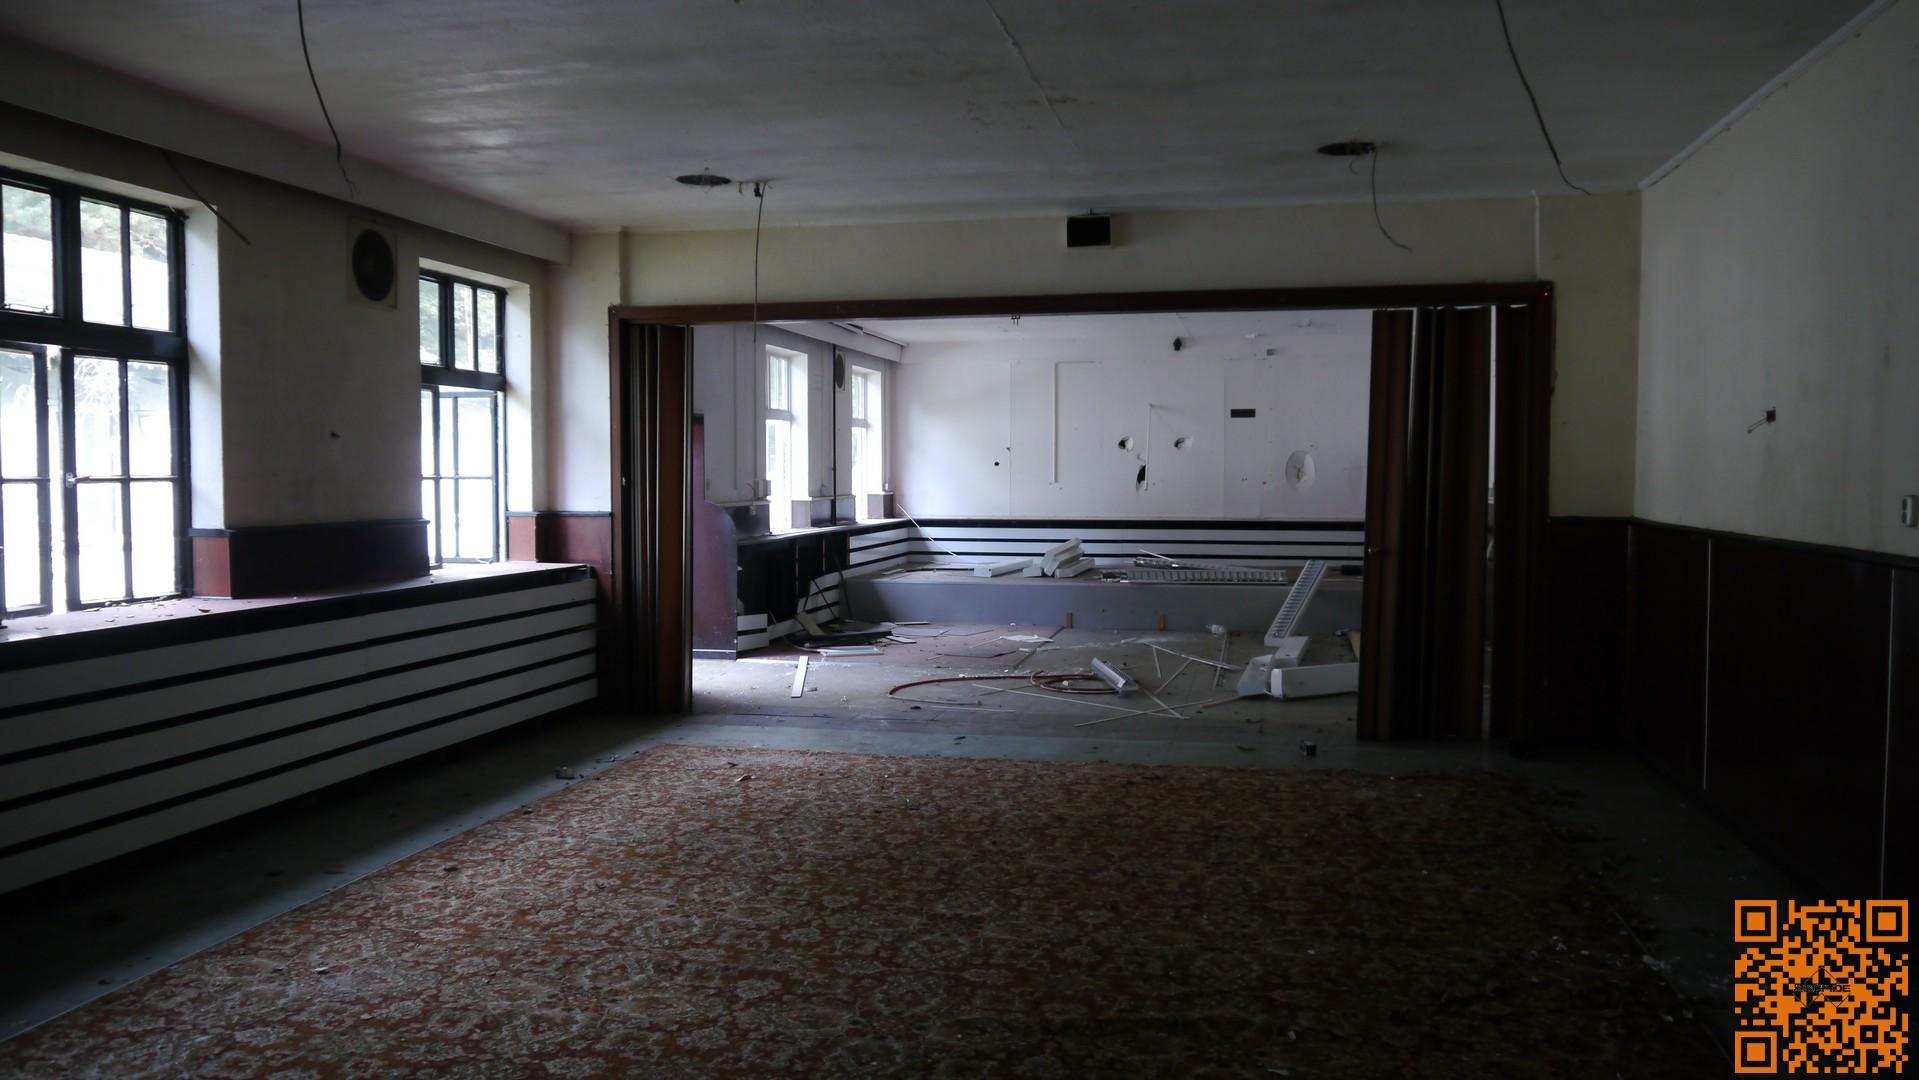 hospital2-17-09-16-30